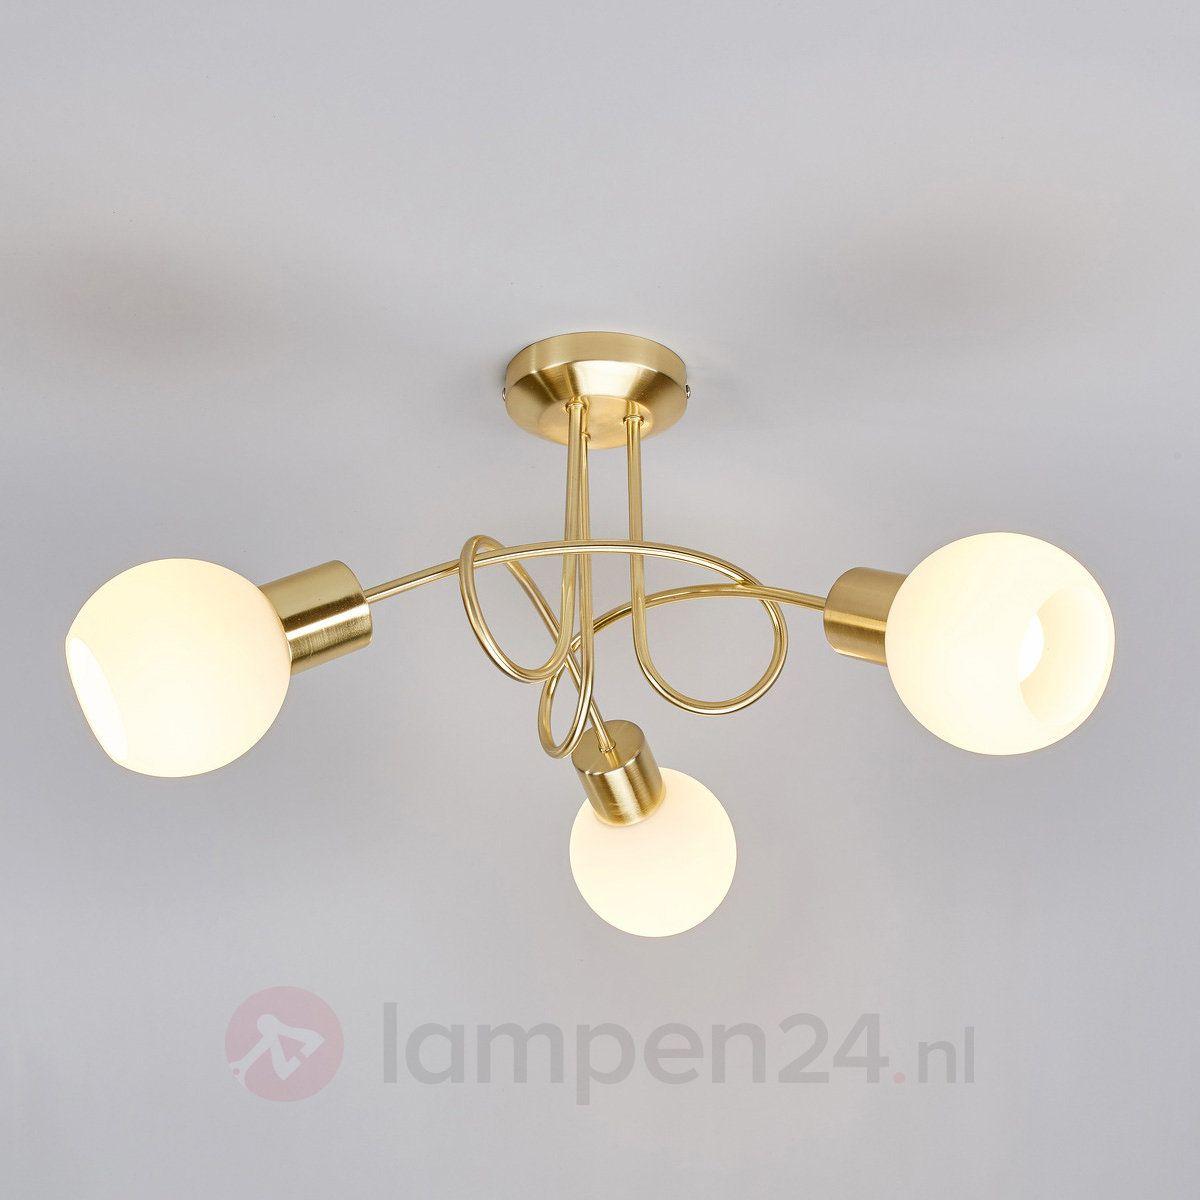 Messingkleurige Led Plafondlamp Elaina 3 Lichts 9620030 Plafondlamp Plafondverlichting Laag Plafond Verlichting